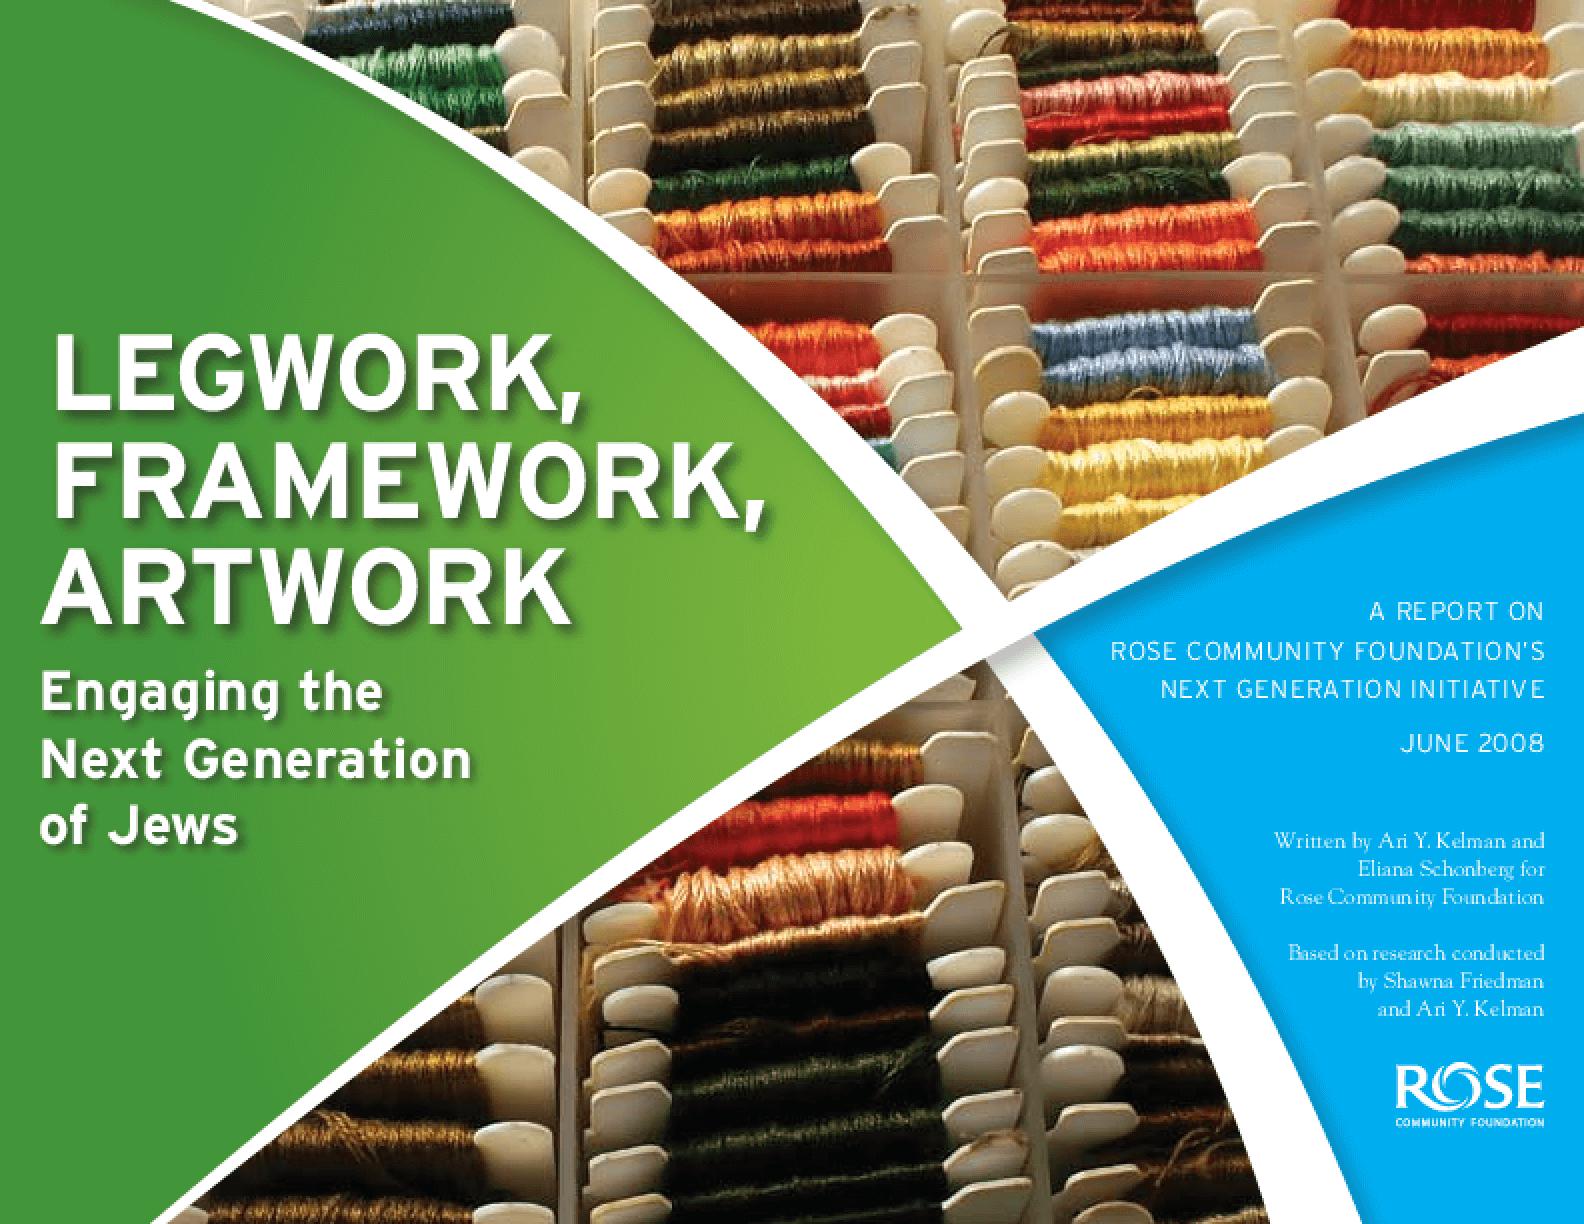 Legwork, Framework, Artwork: Engaging the Next Generation of Jews: A Report on the Rose Community Foundation's Next Generation Initiative